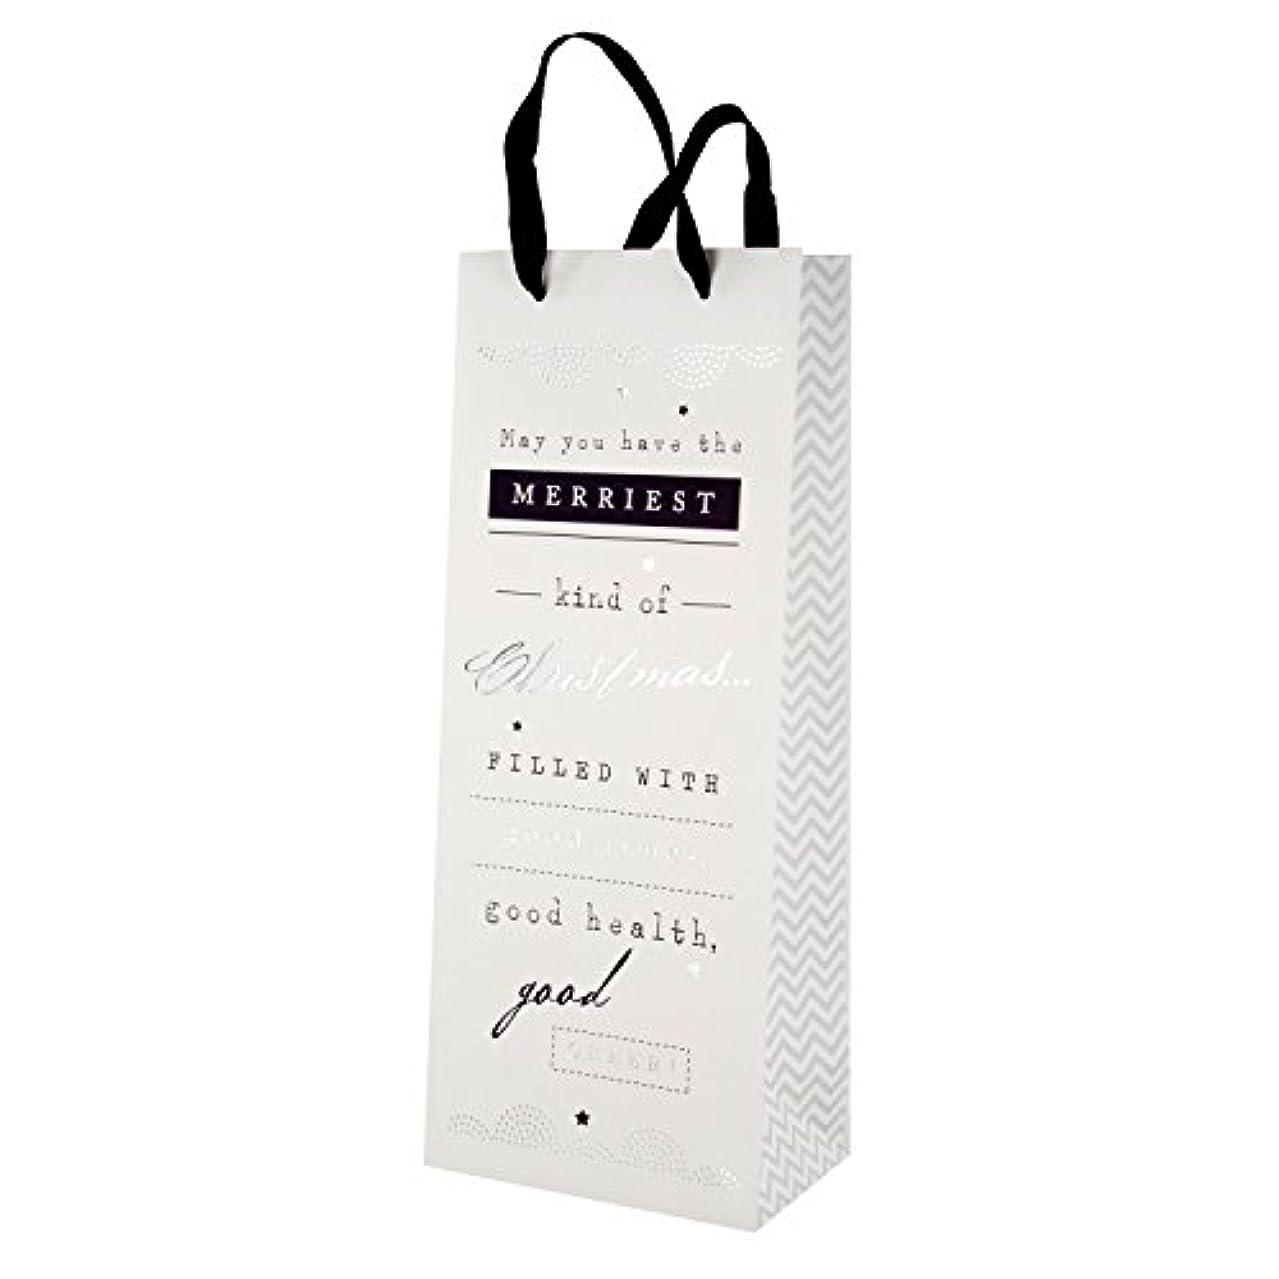 Hallmark Christmas Gift Bag 'Good Cheer' - Bottle